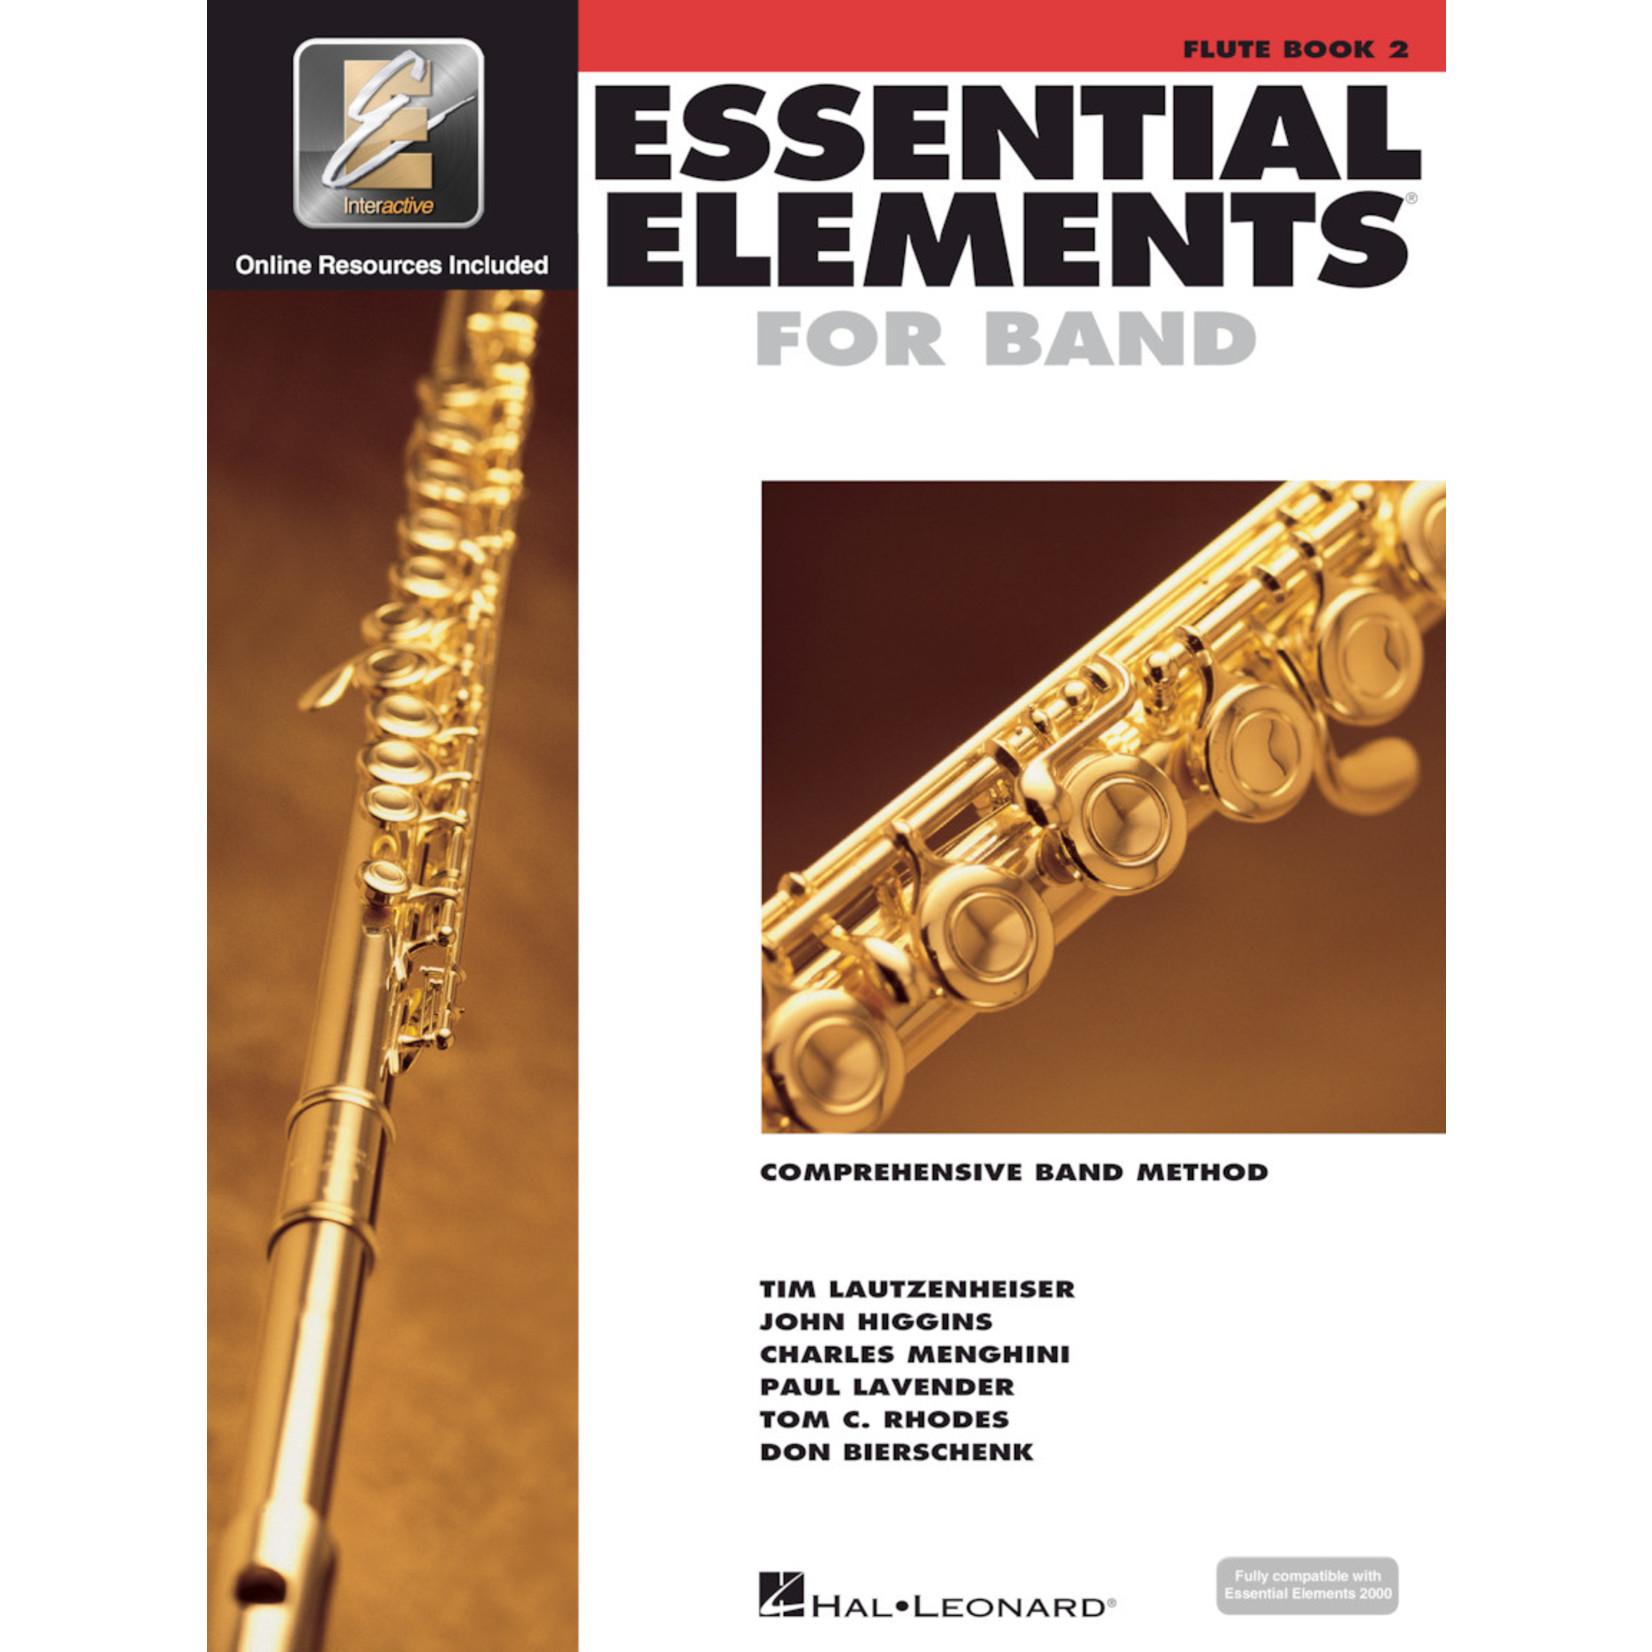 Hal Leonard Essential Elements for Band Flute Book 2